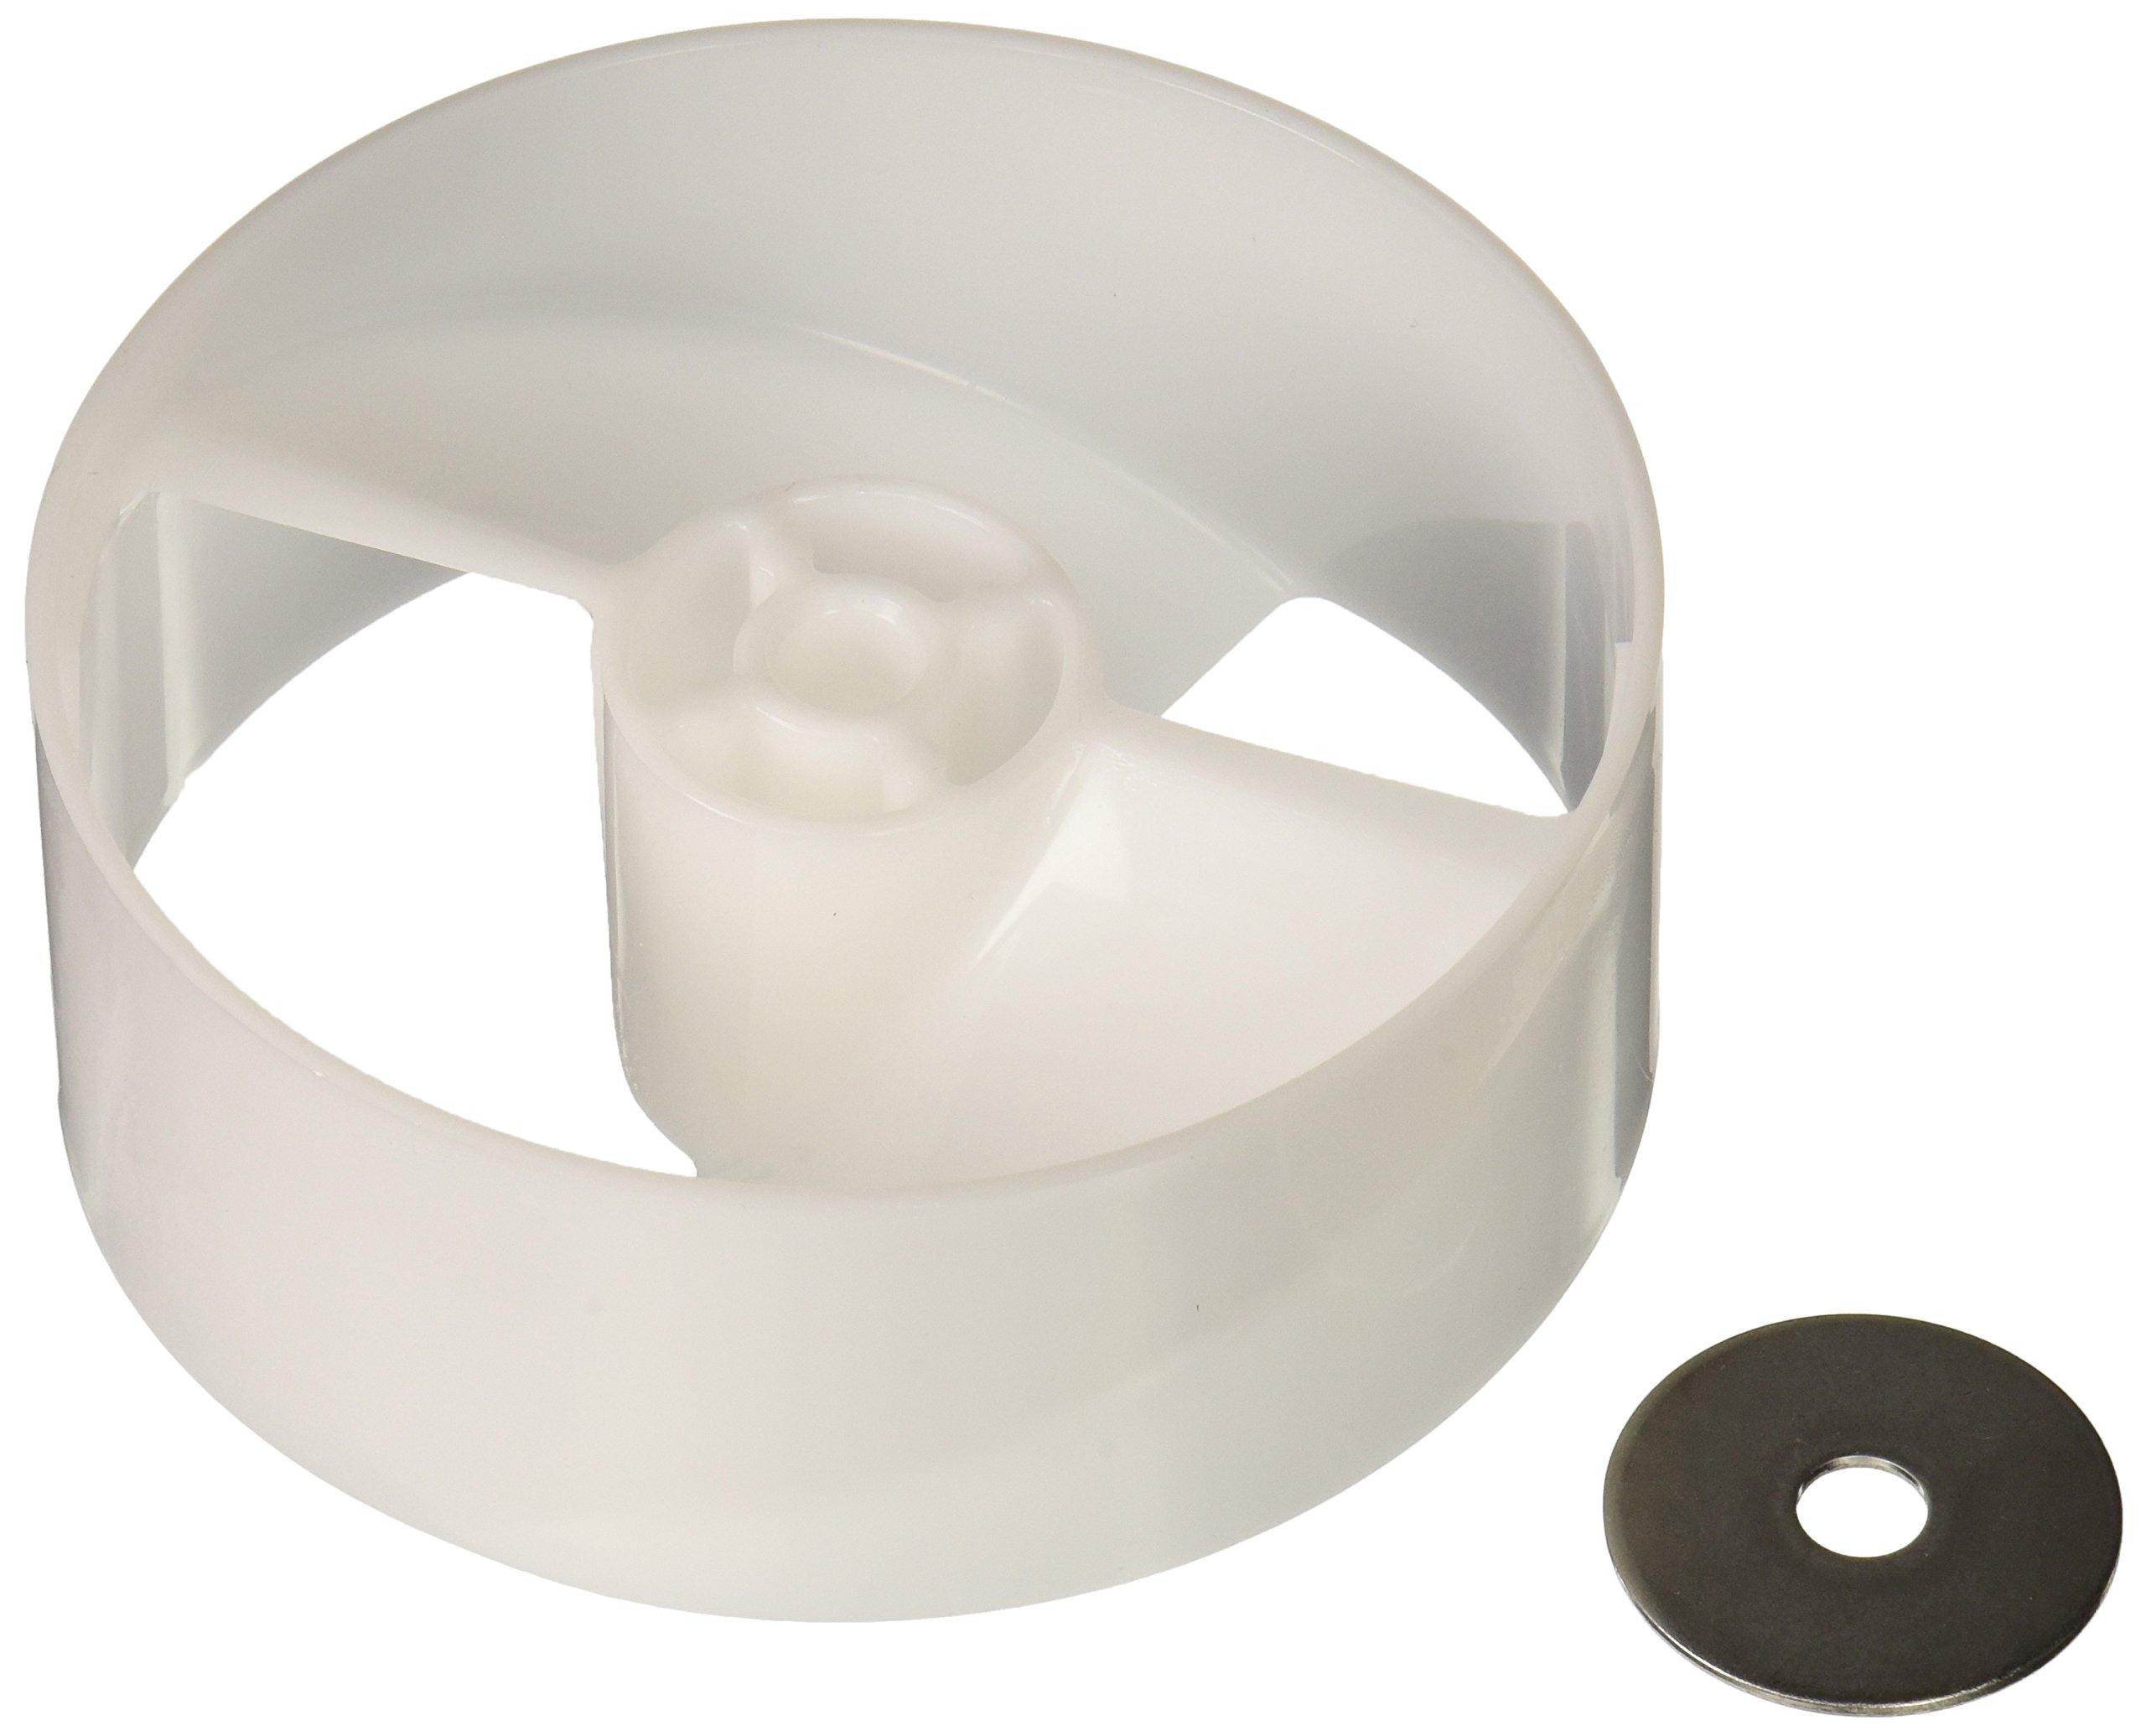 Whirlpool 4388736 Ice Dispenser Drum